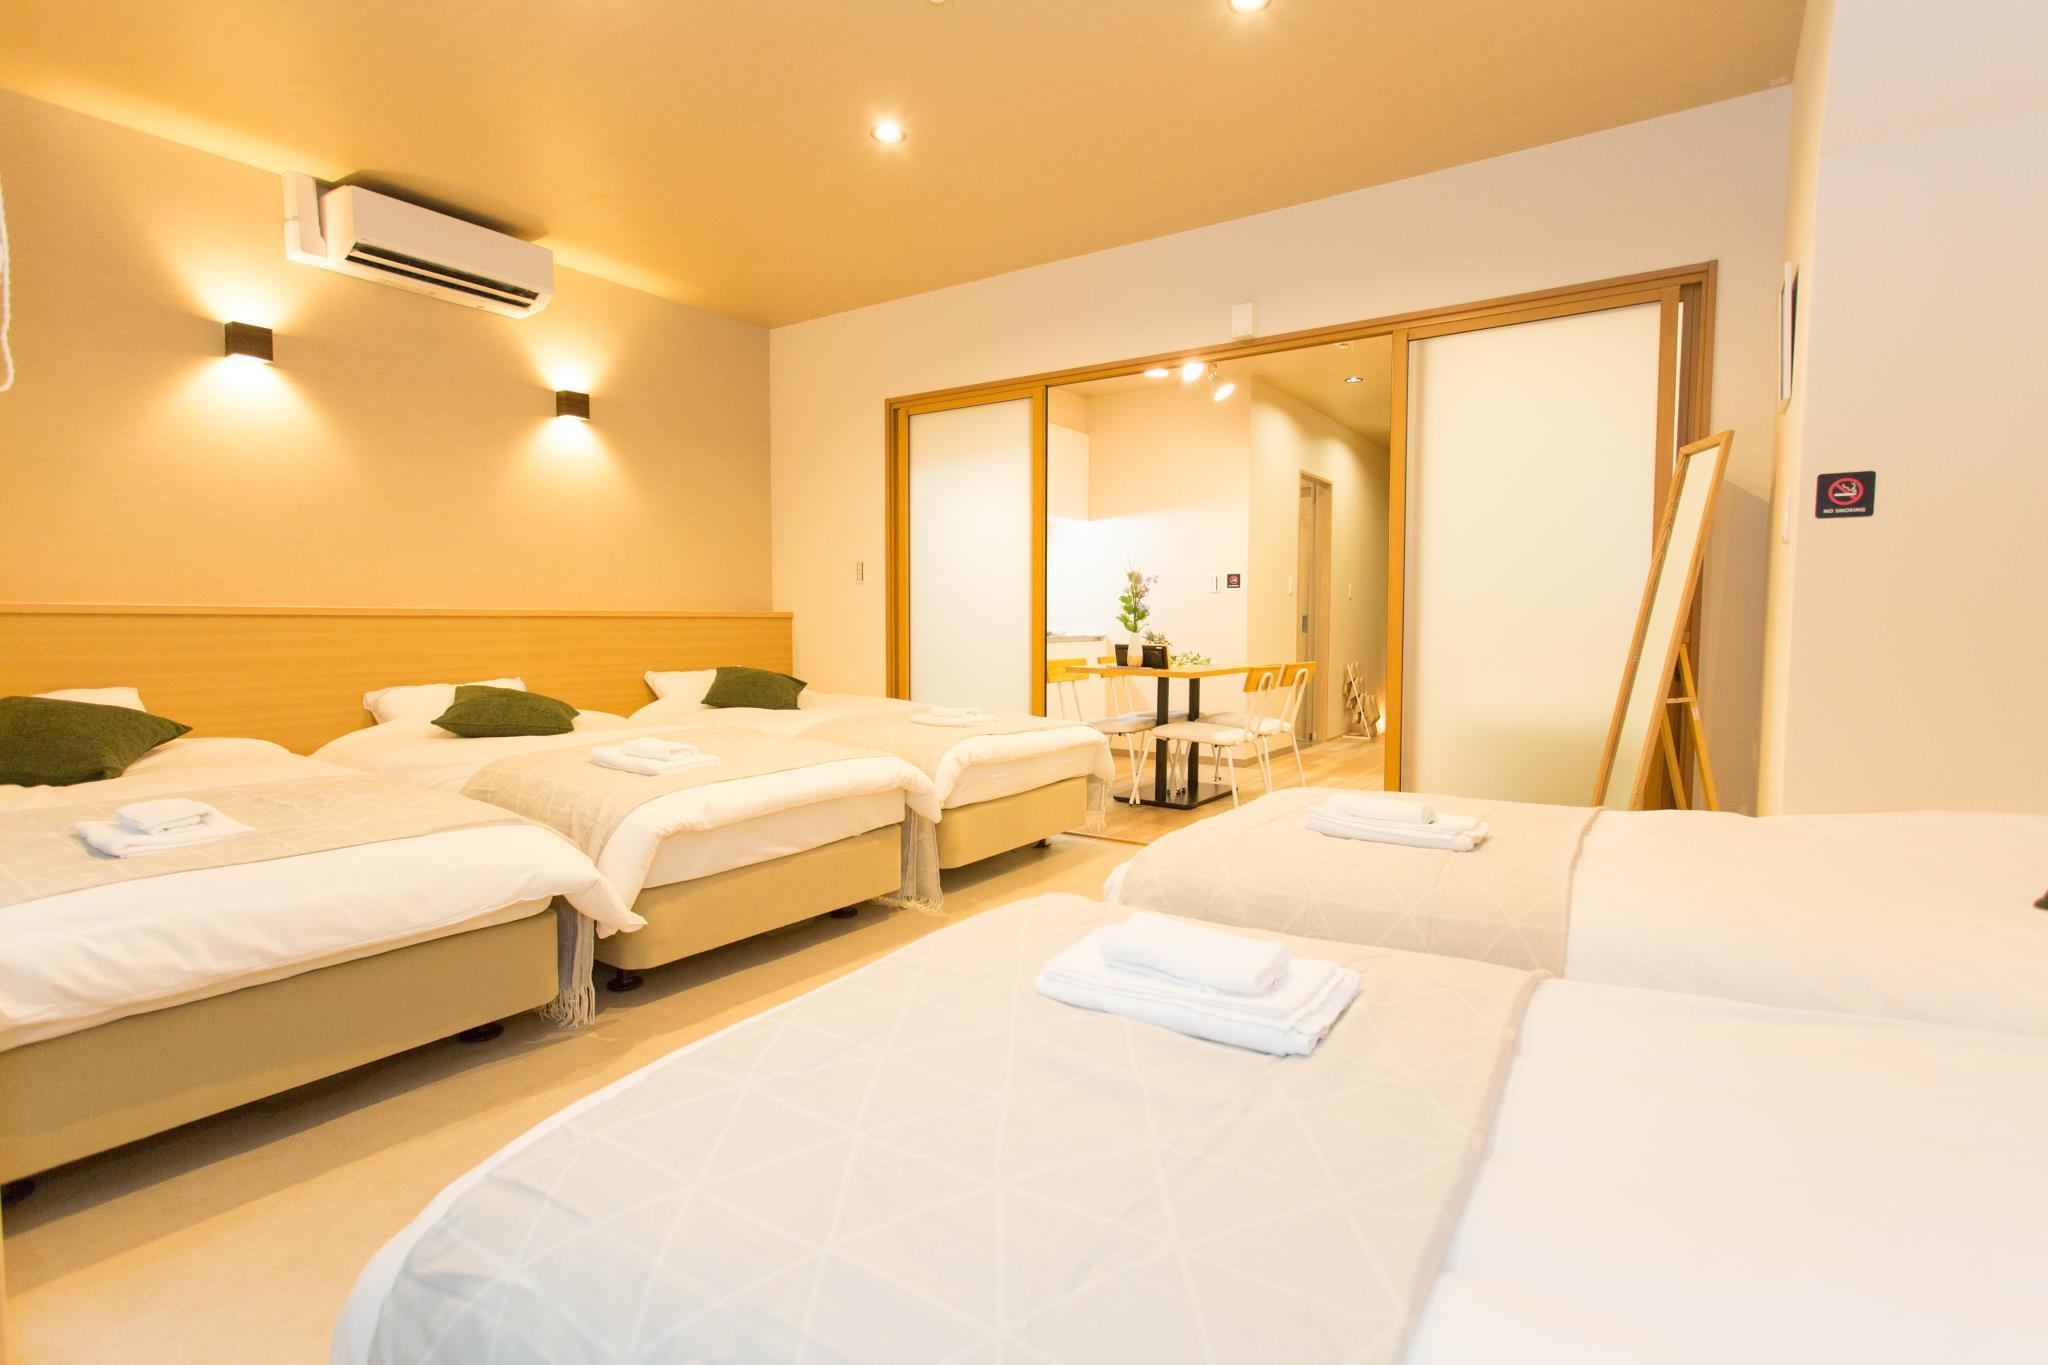 01 Group Stay CLASSE New Hostel In Nanba 6p